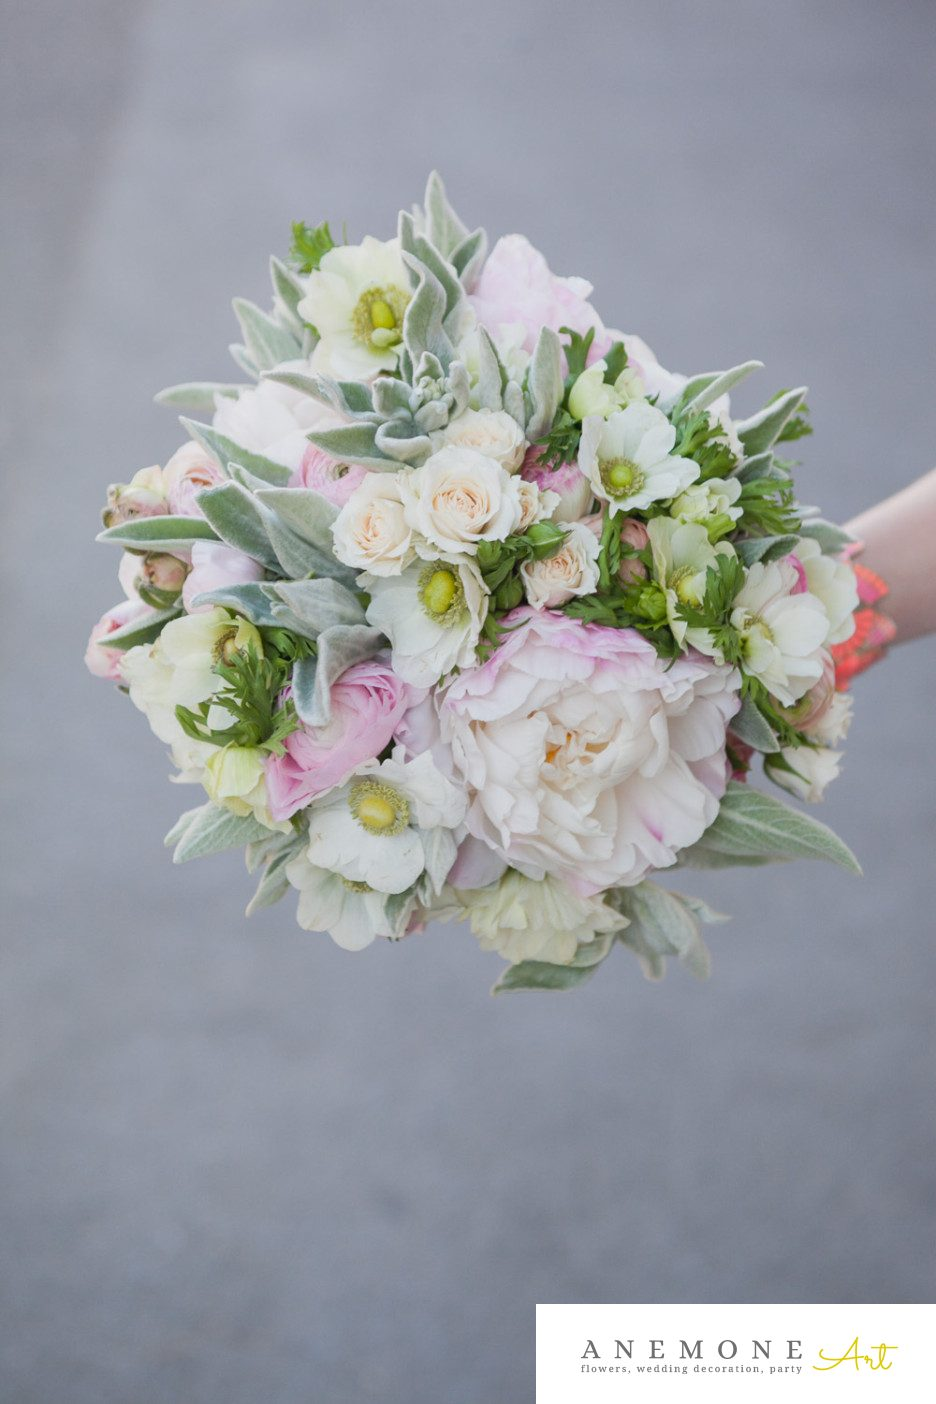 Poza, foto cu Flori de nunta anemone, buchet nasa, bujori, roz, verde mint in Arad, Timisoara, Oradea (wedding flowers, bouquets) nunta Arad, Timisoara, Oradea